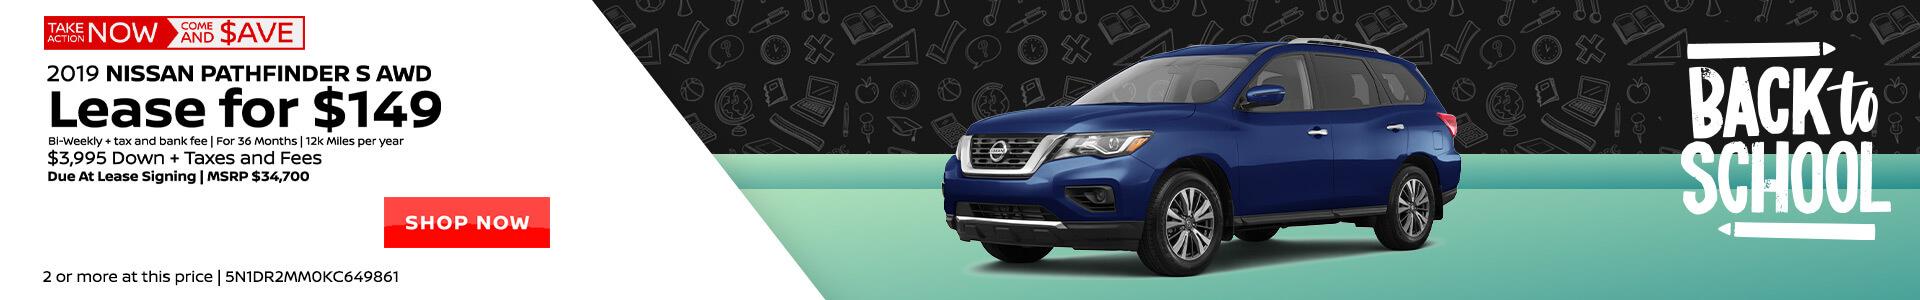 Nissan Pathfinder $149 Lease